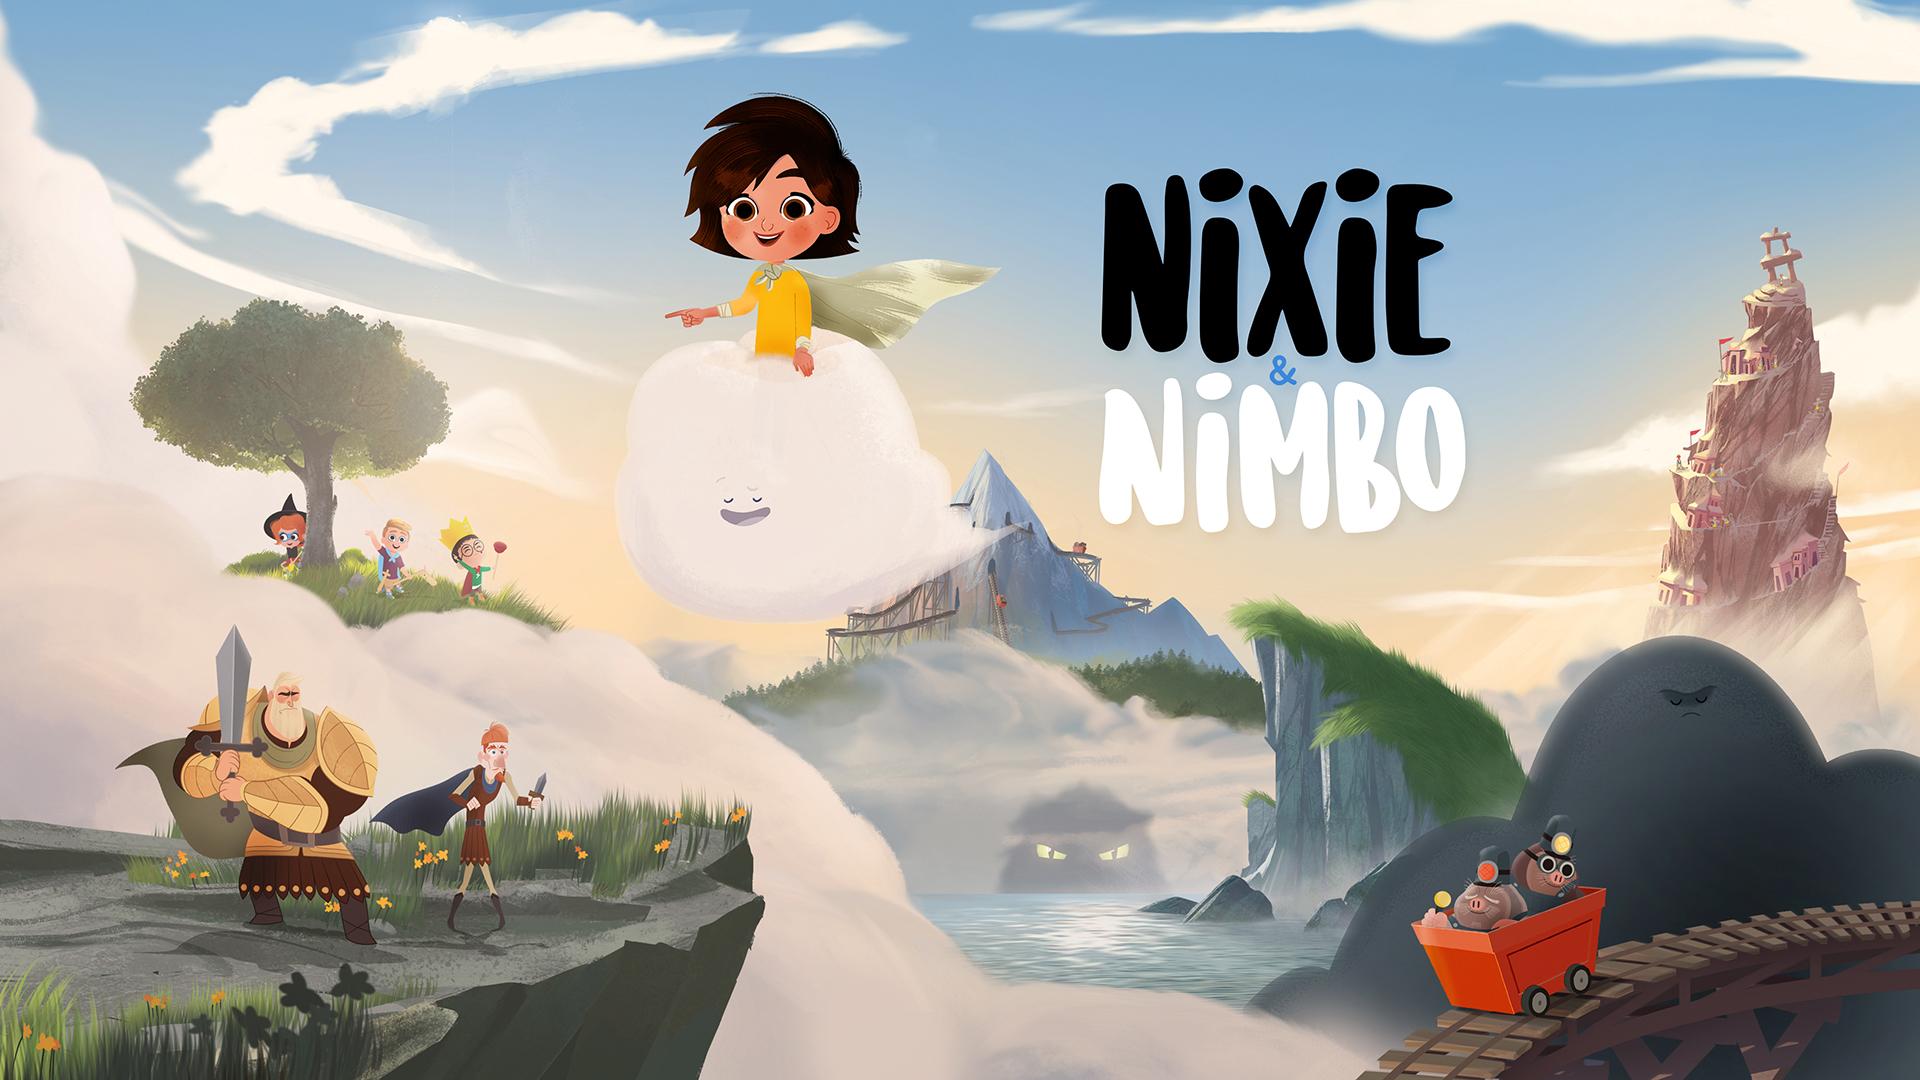 Nixie & Nimbo Trailer